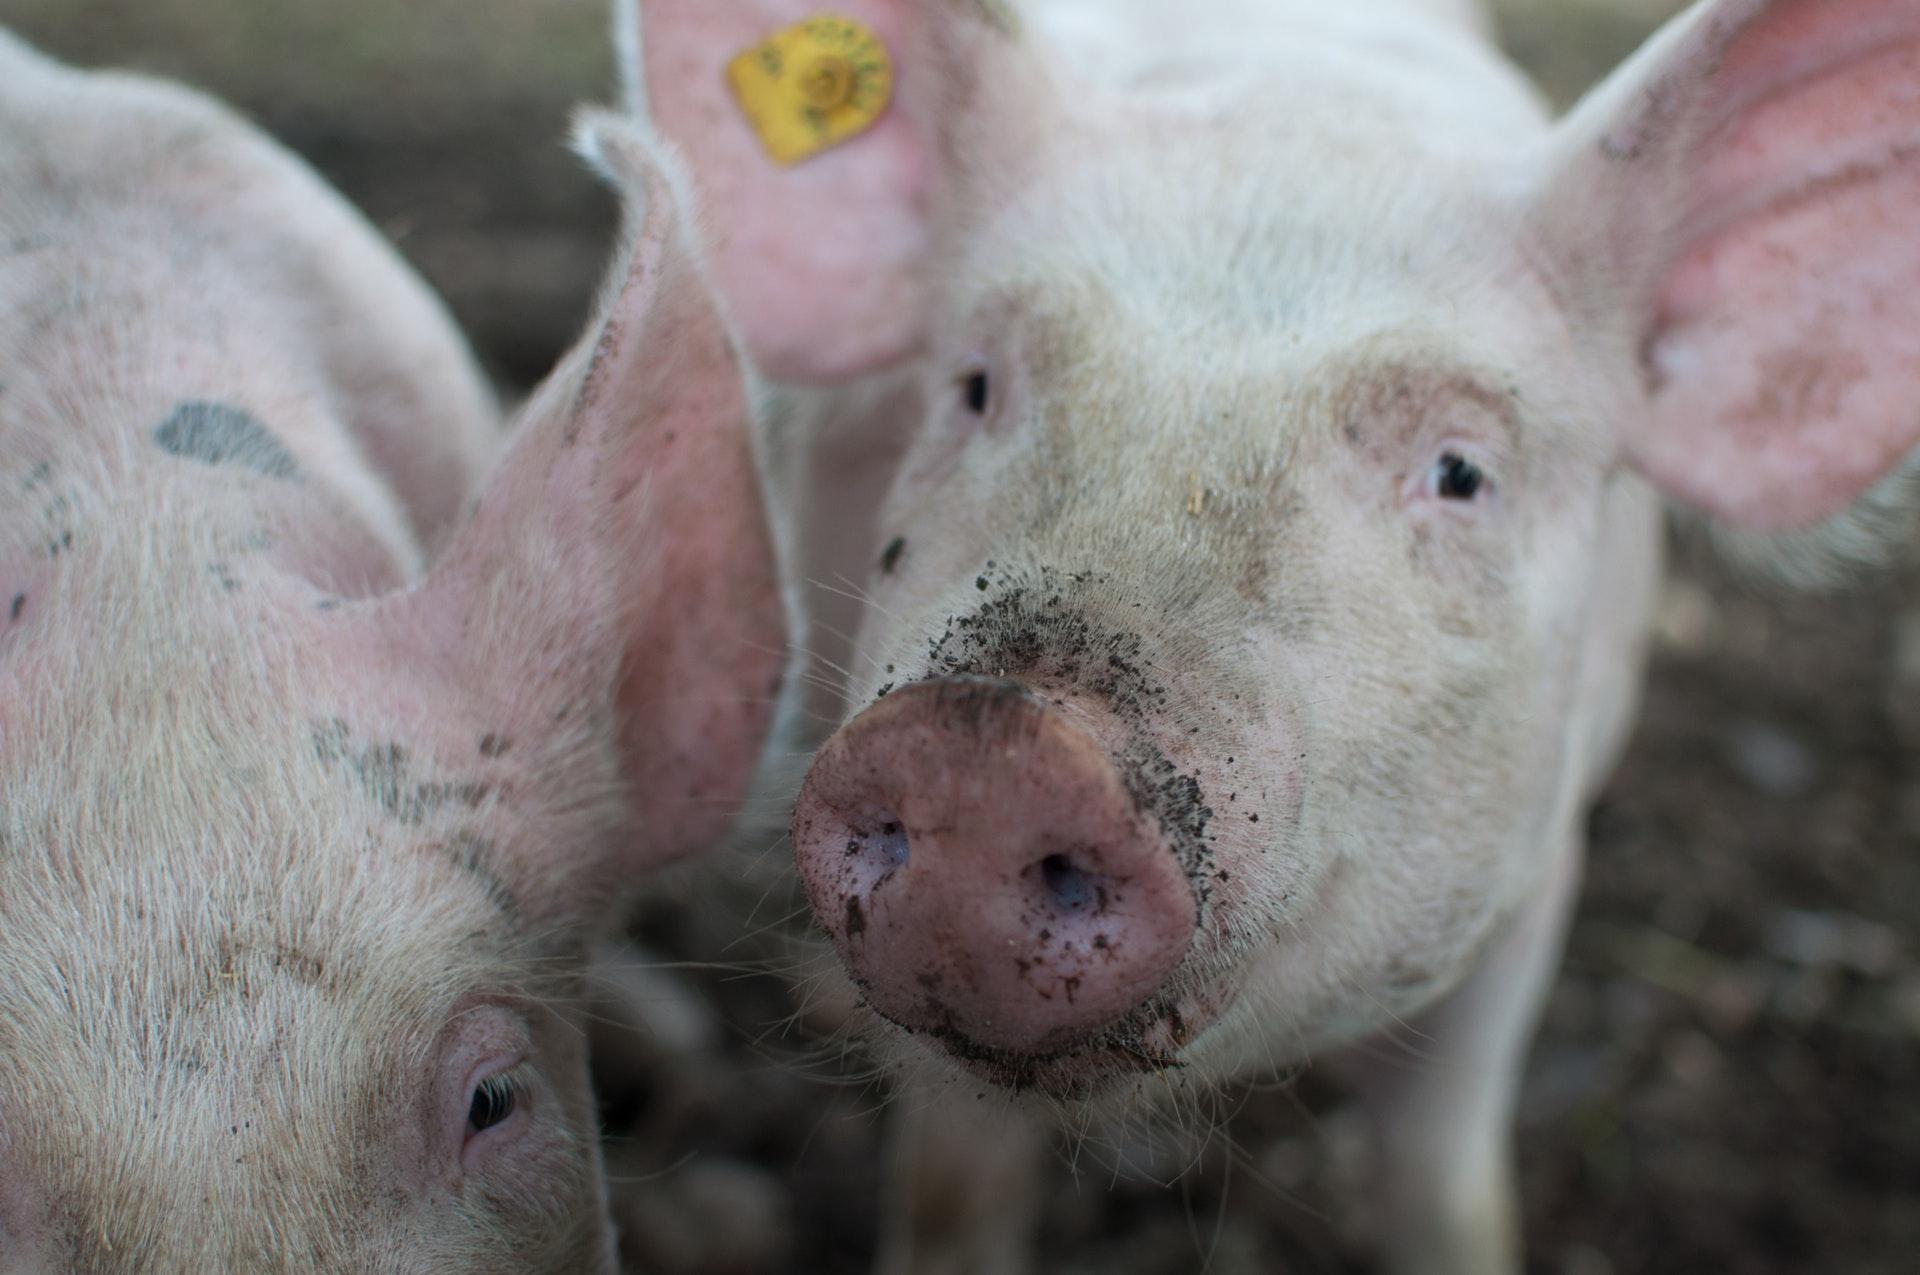 Gris, svin, svinekød, grise, gård, dyr, dyrevelfærd, dyrenes beskyttelse